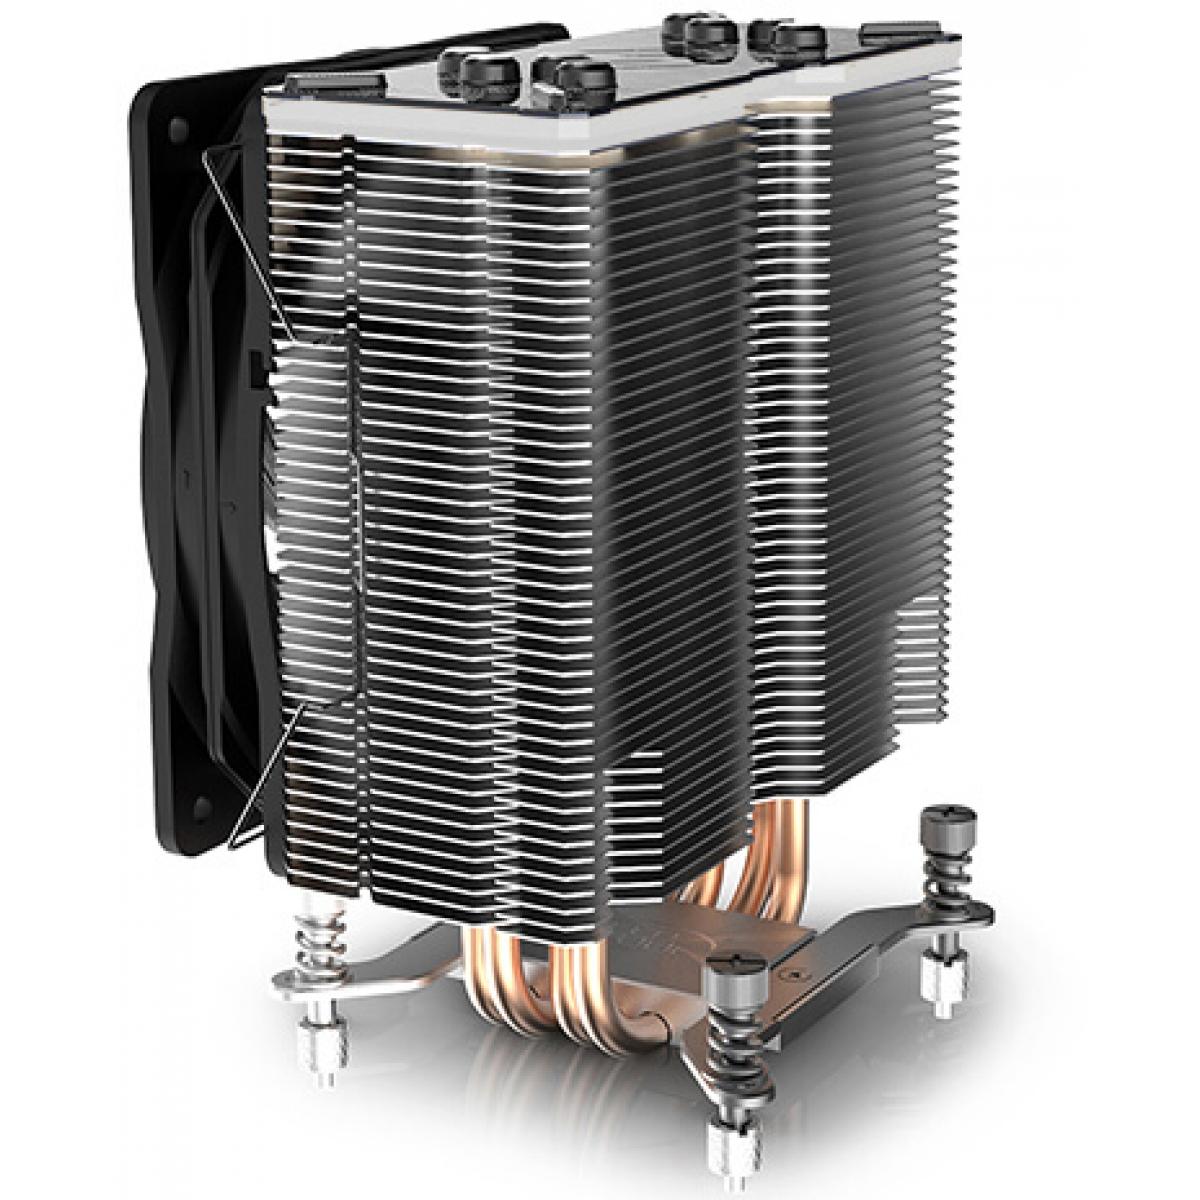 Cooler para Processador DeepCool Gammaxx GT TGA, RGB 120mm, Intel-AMD, DP-MCH4-GMX-GT-TUF